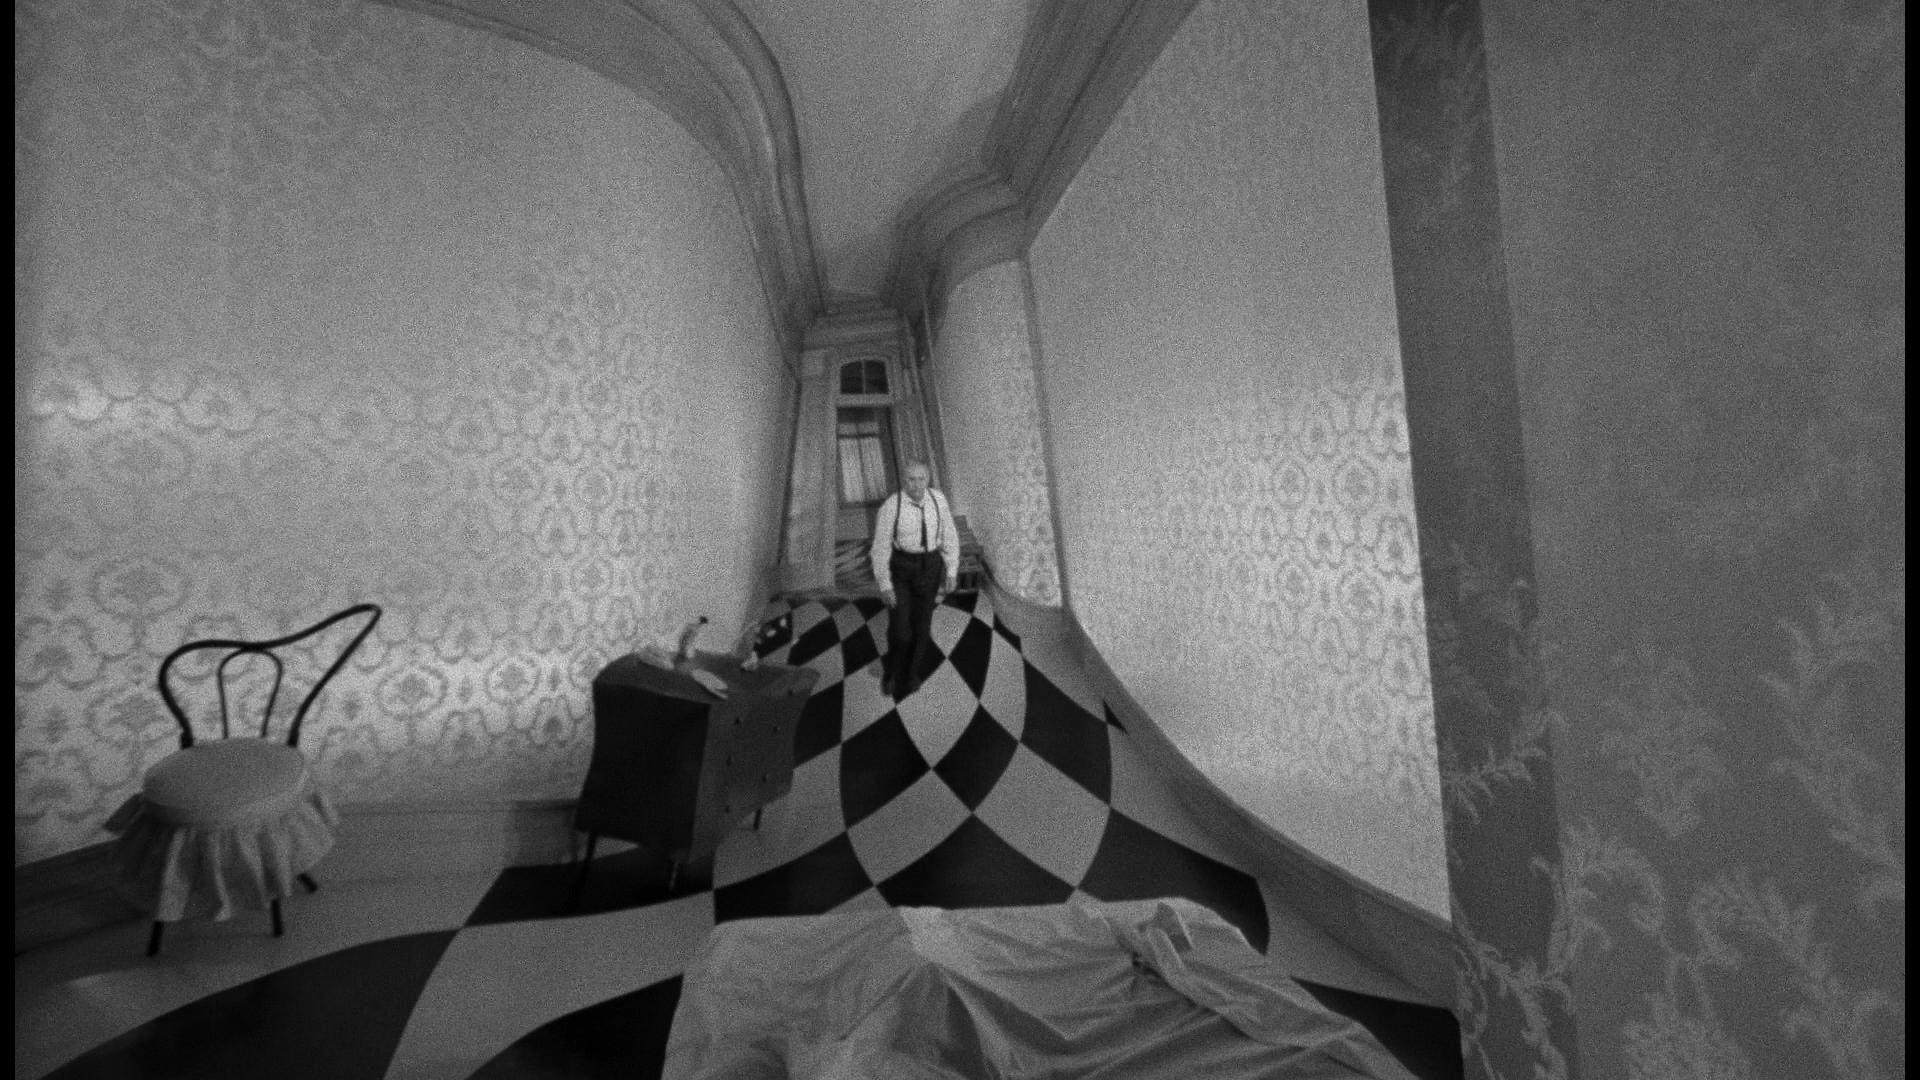 Une scène de rêve digne de Dali et de Caligari